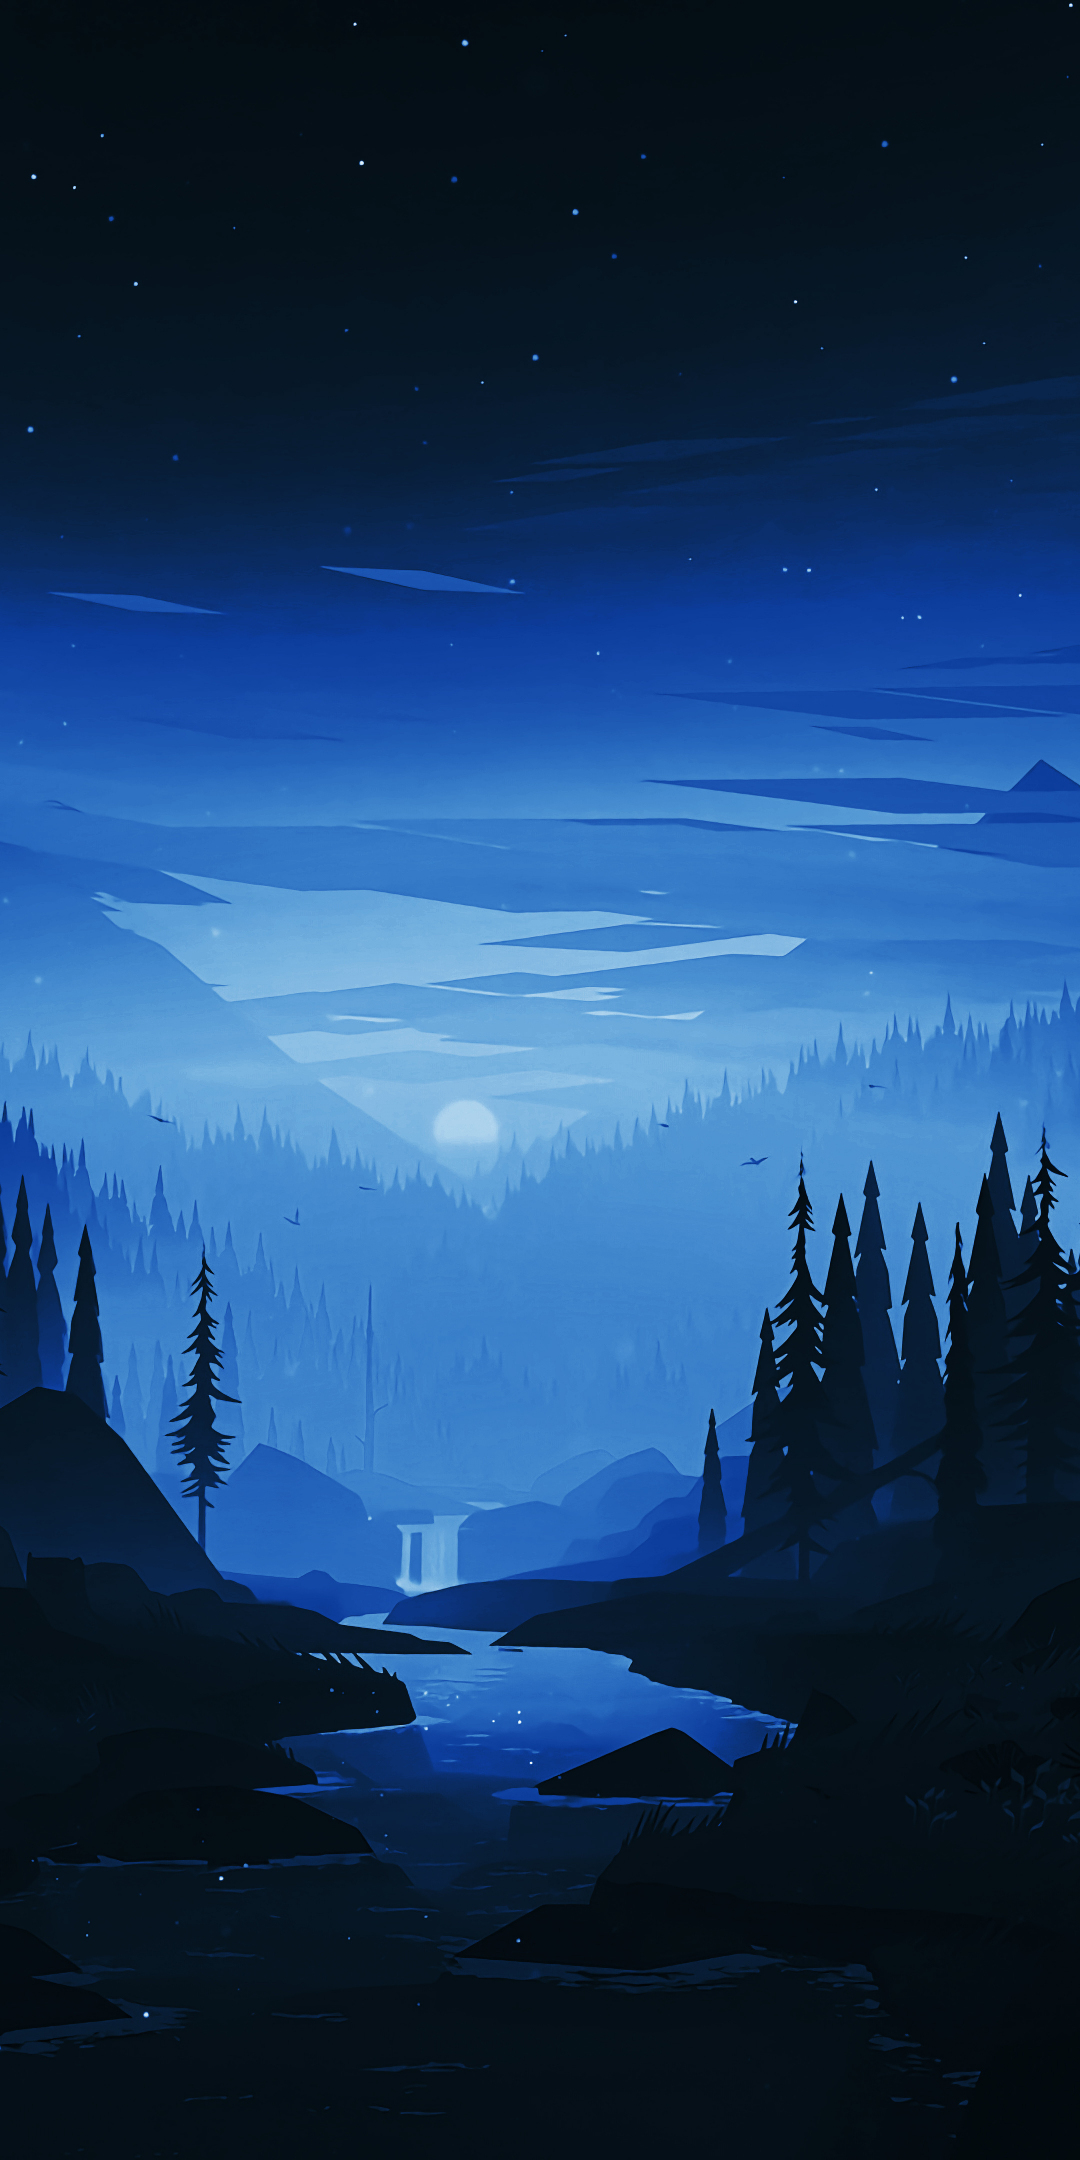 Download 1080x2160 Wallpaper Dark Night River Forest